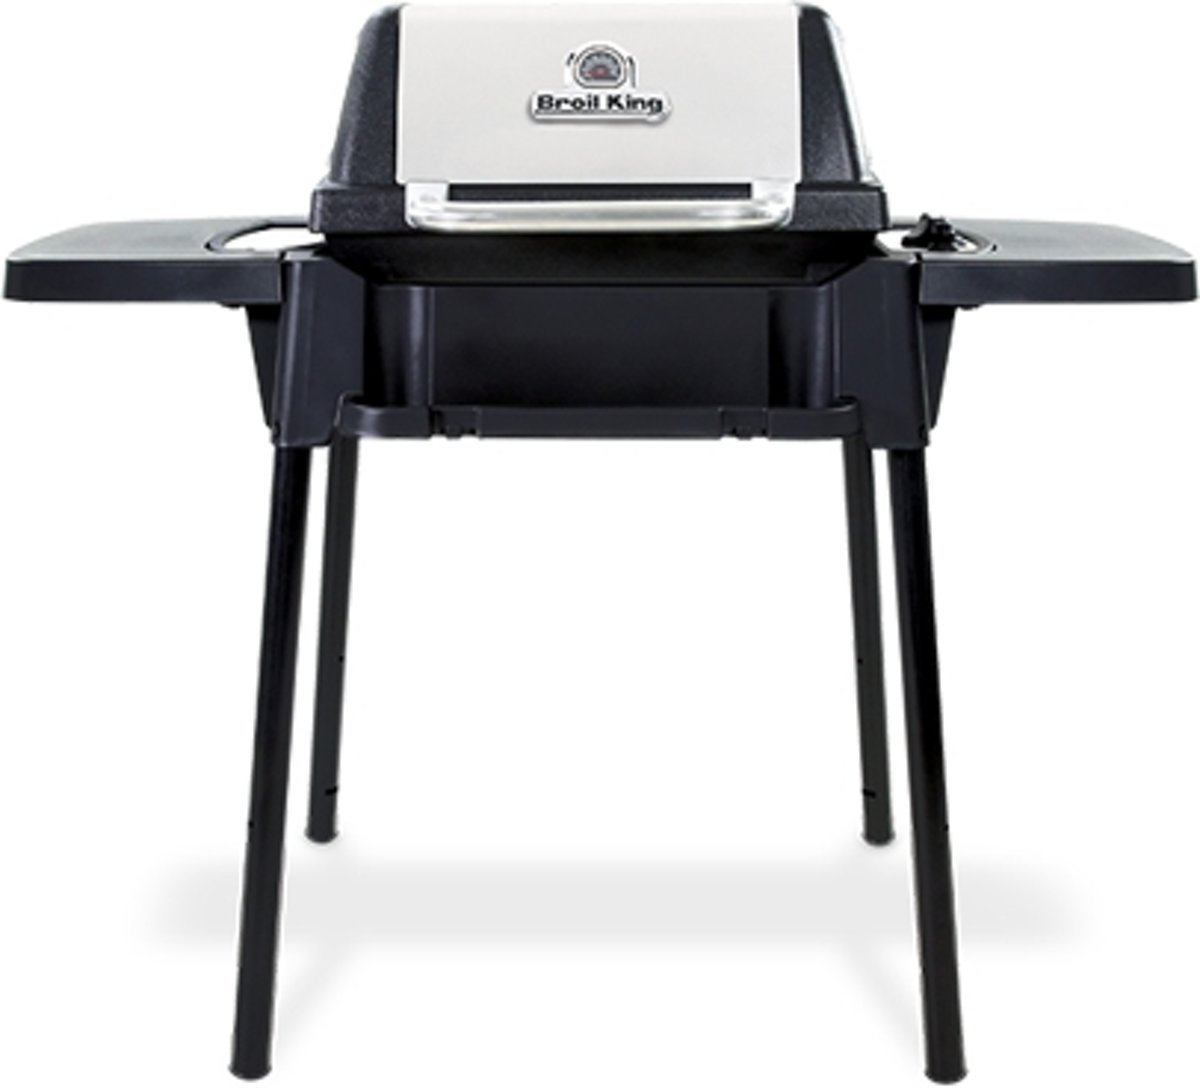 Broil King Porta-Chef 120 Grill Kookunit Natuurlijk gas 4100W Zwart